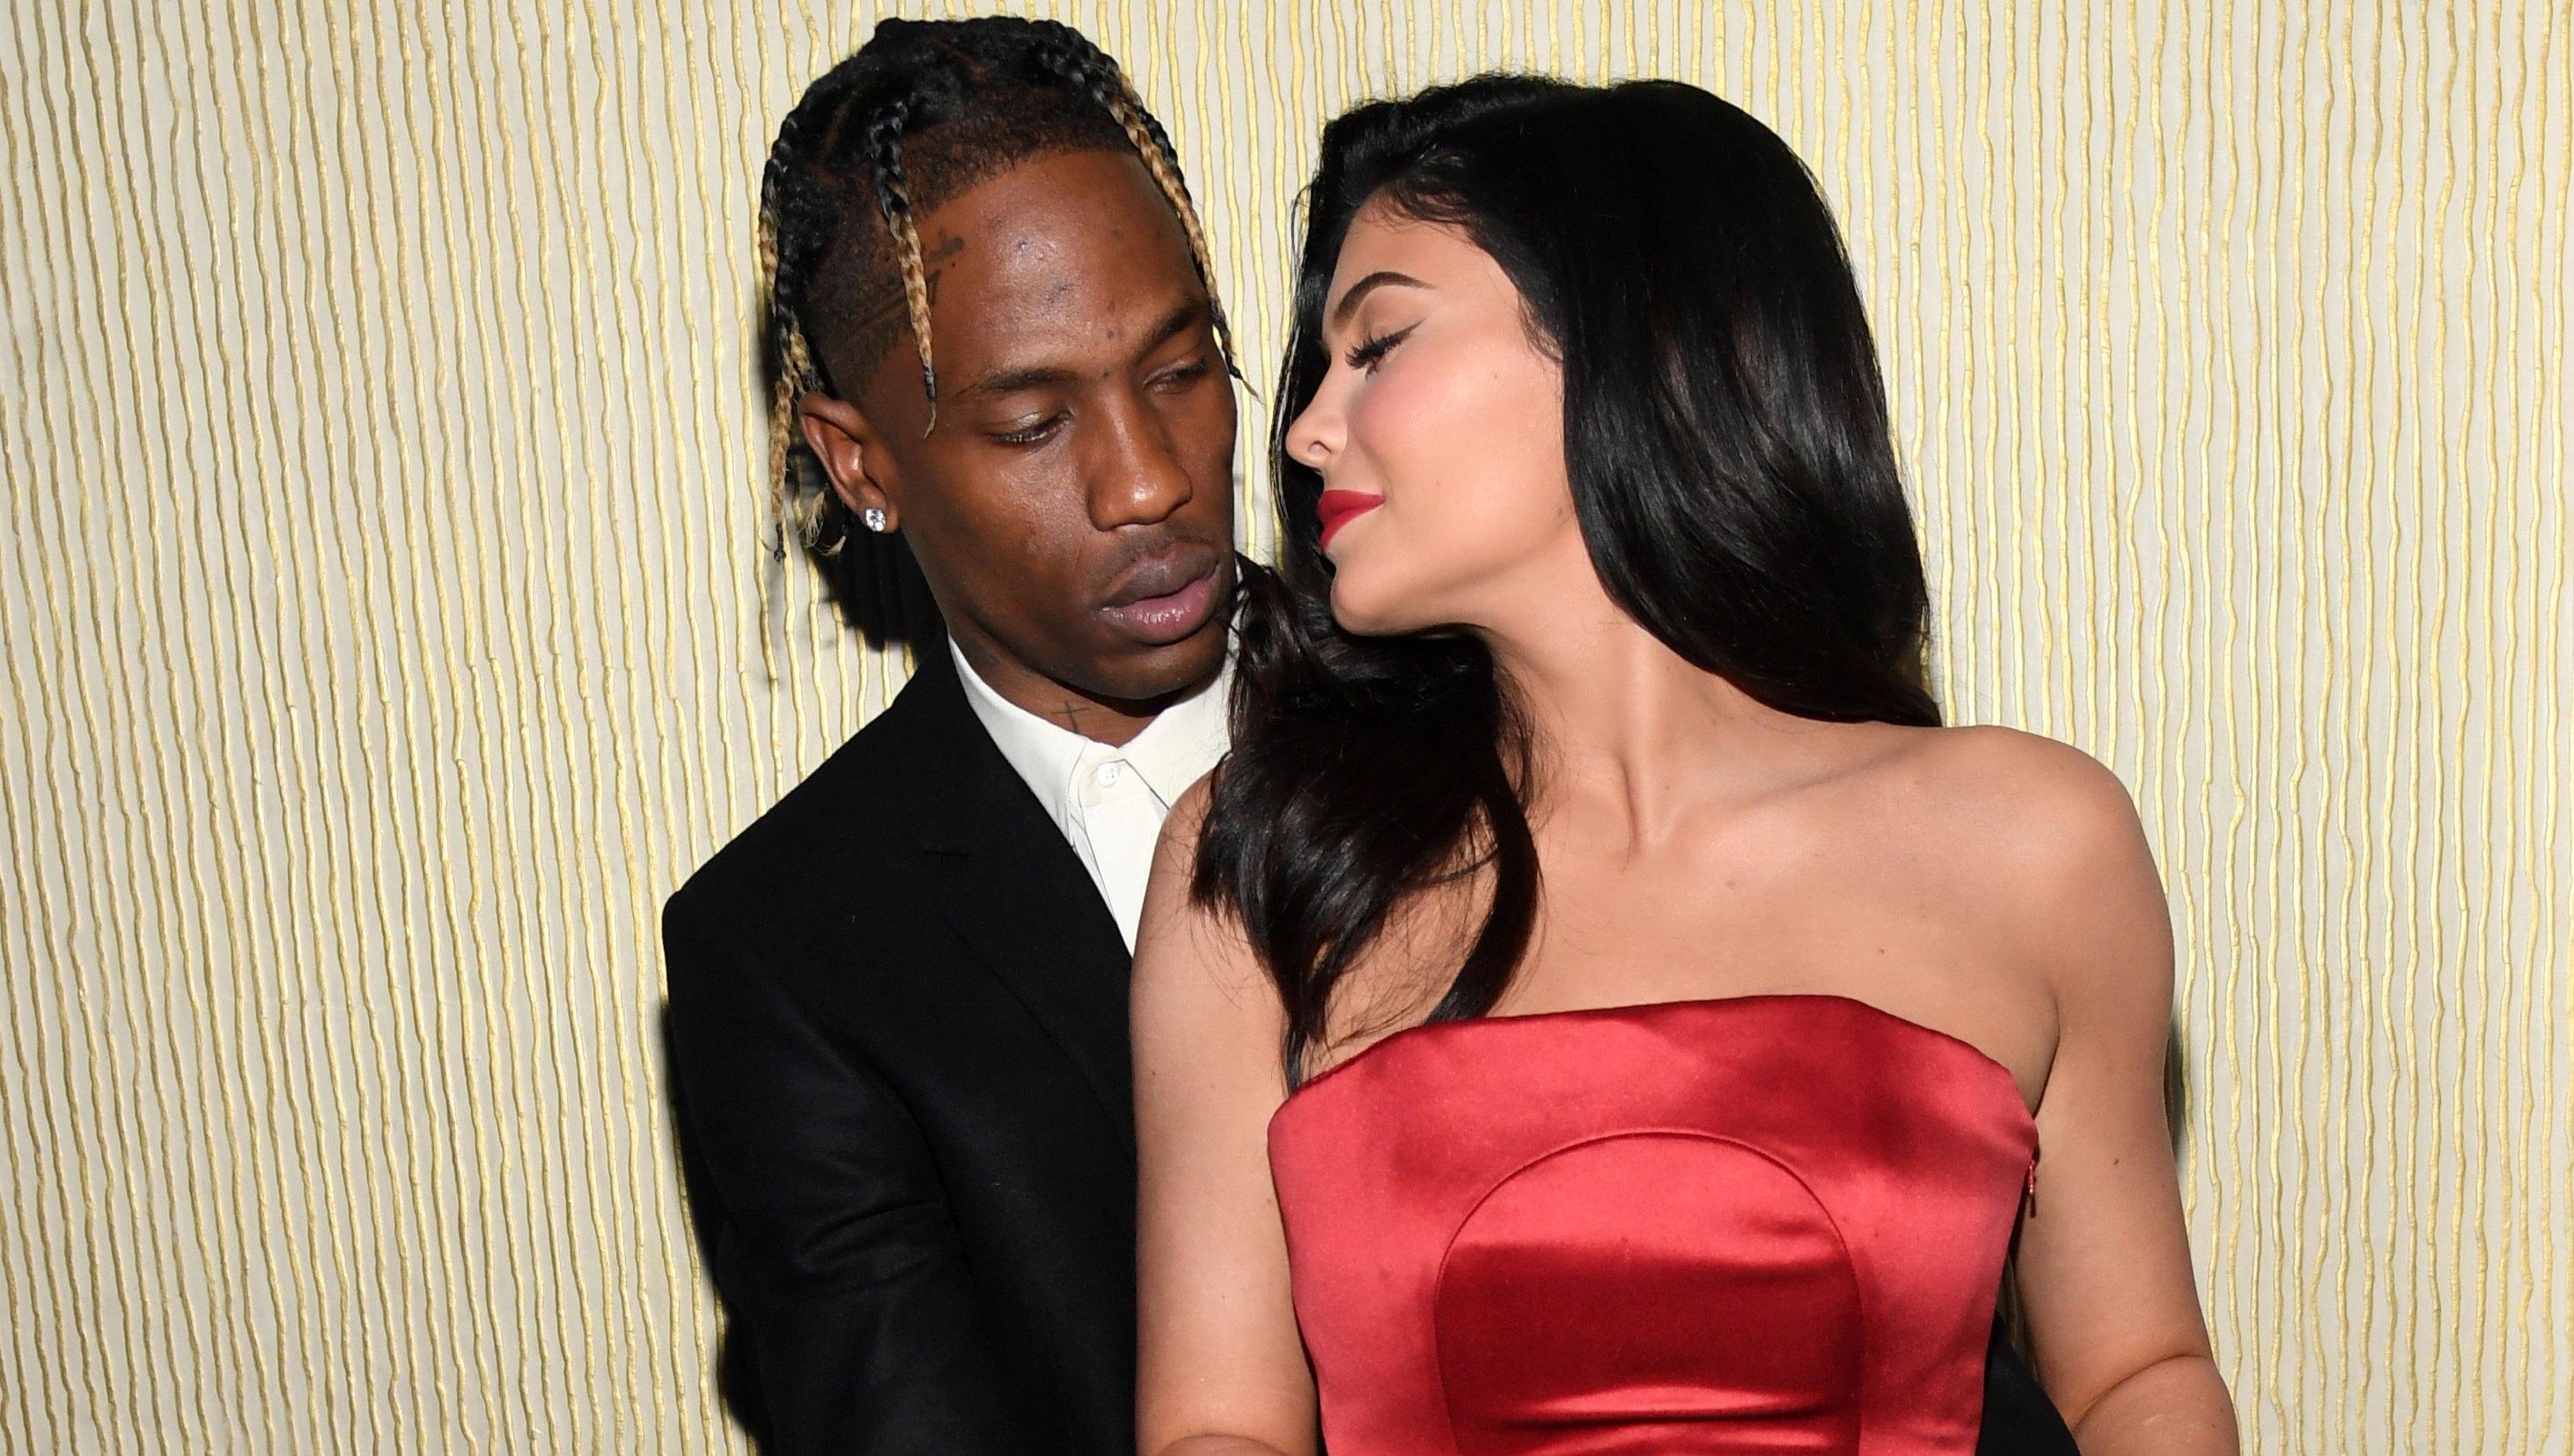 Kylie Jenner and Travis Scott Flirty Instagram